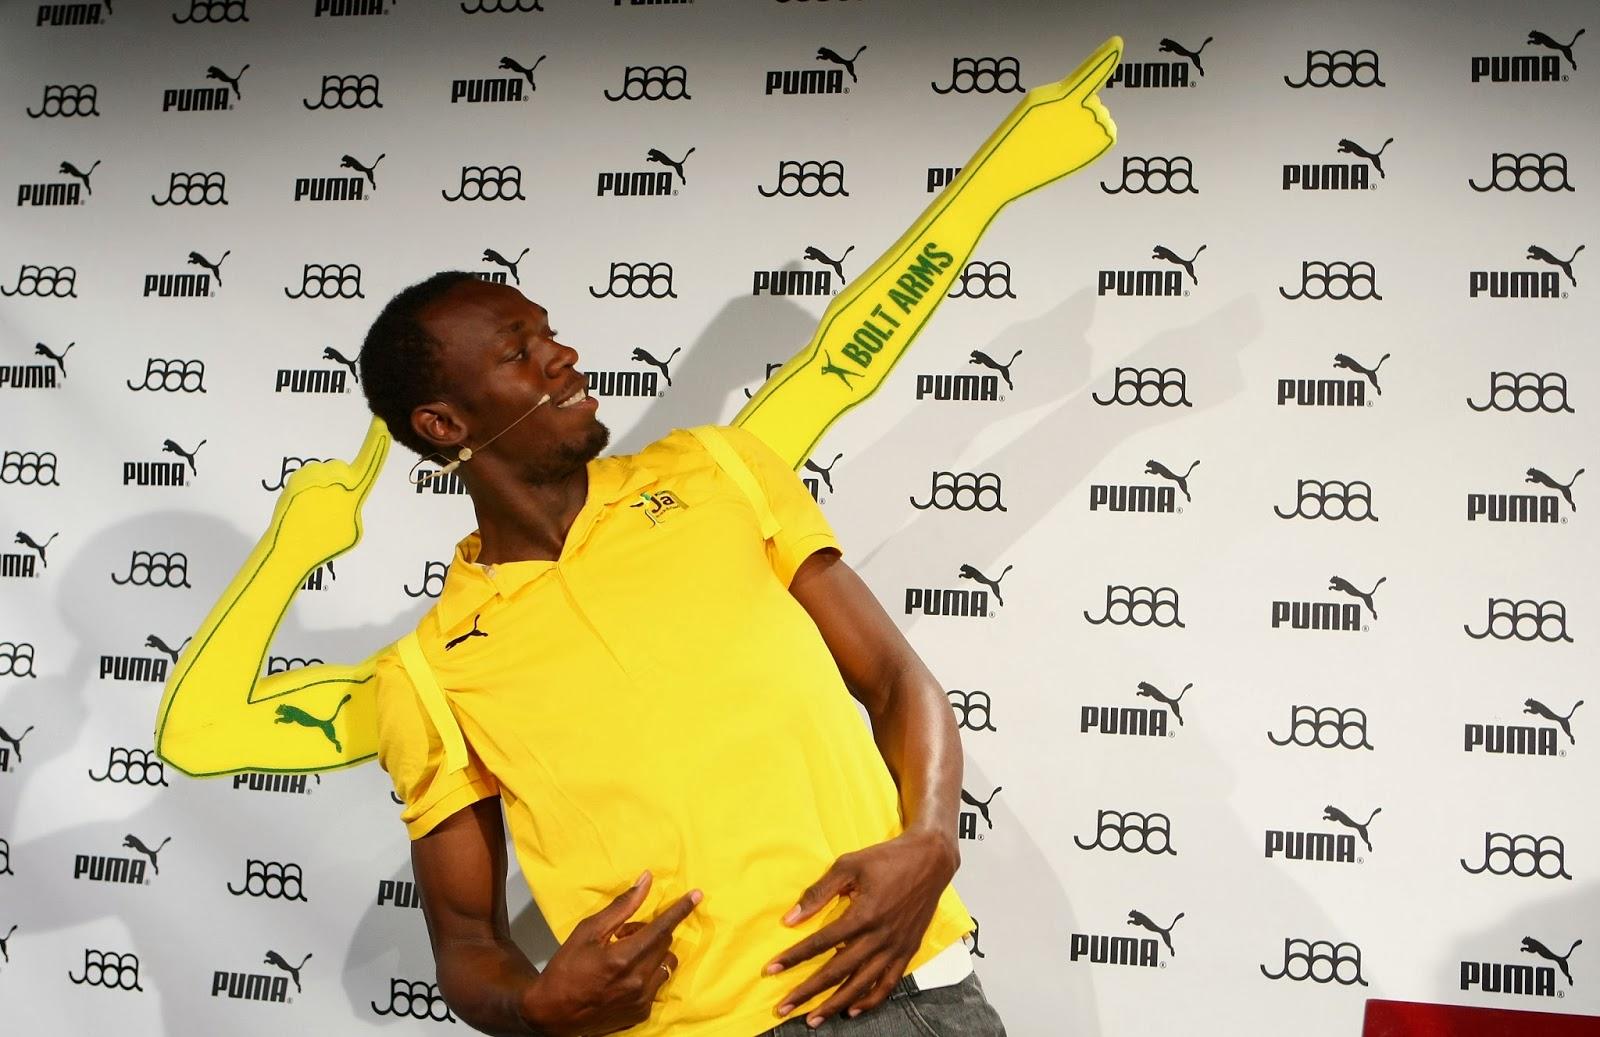 Puma planea ofrecerle un trabajo a Usain Bolt luego de su retiro